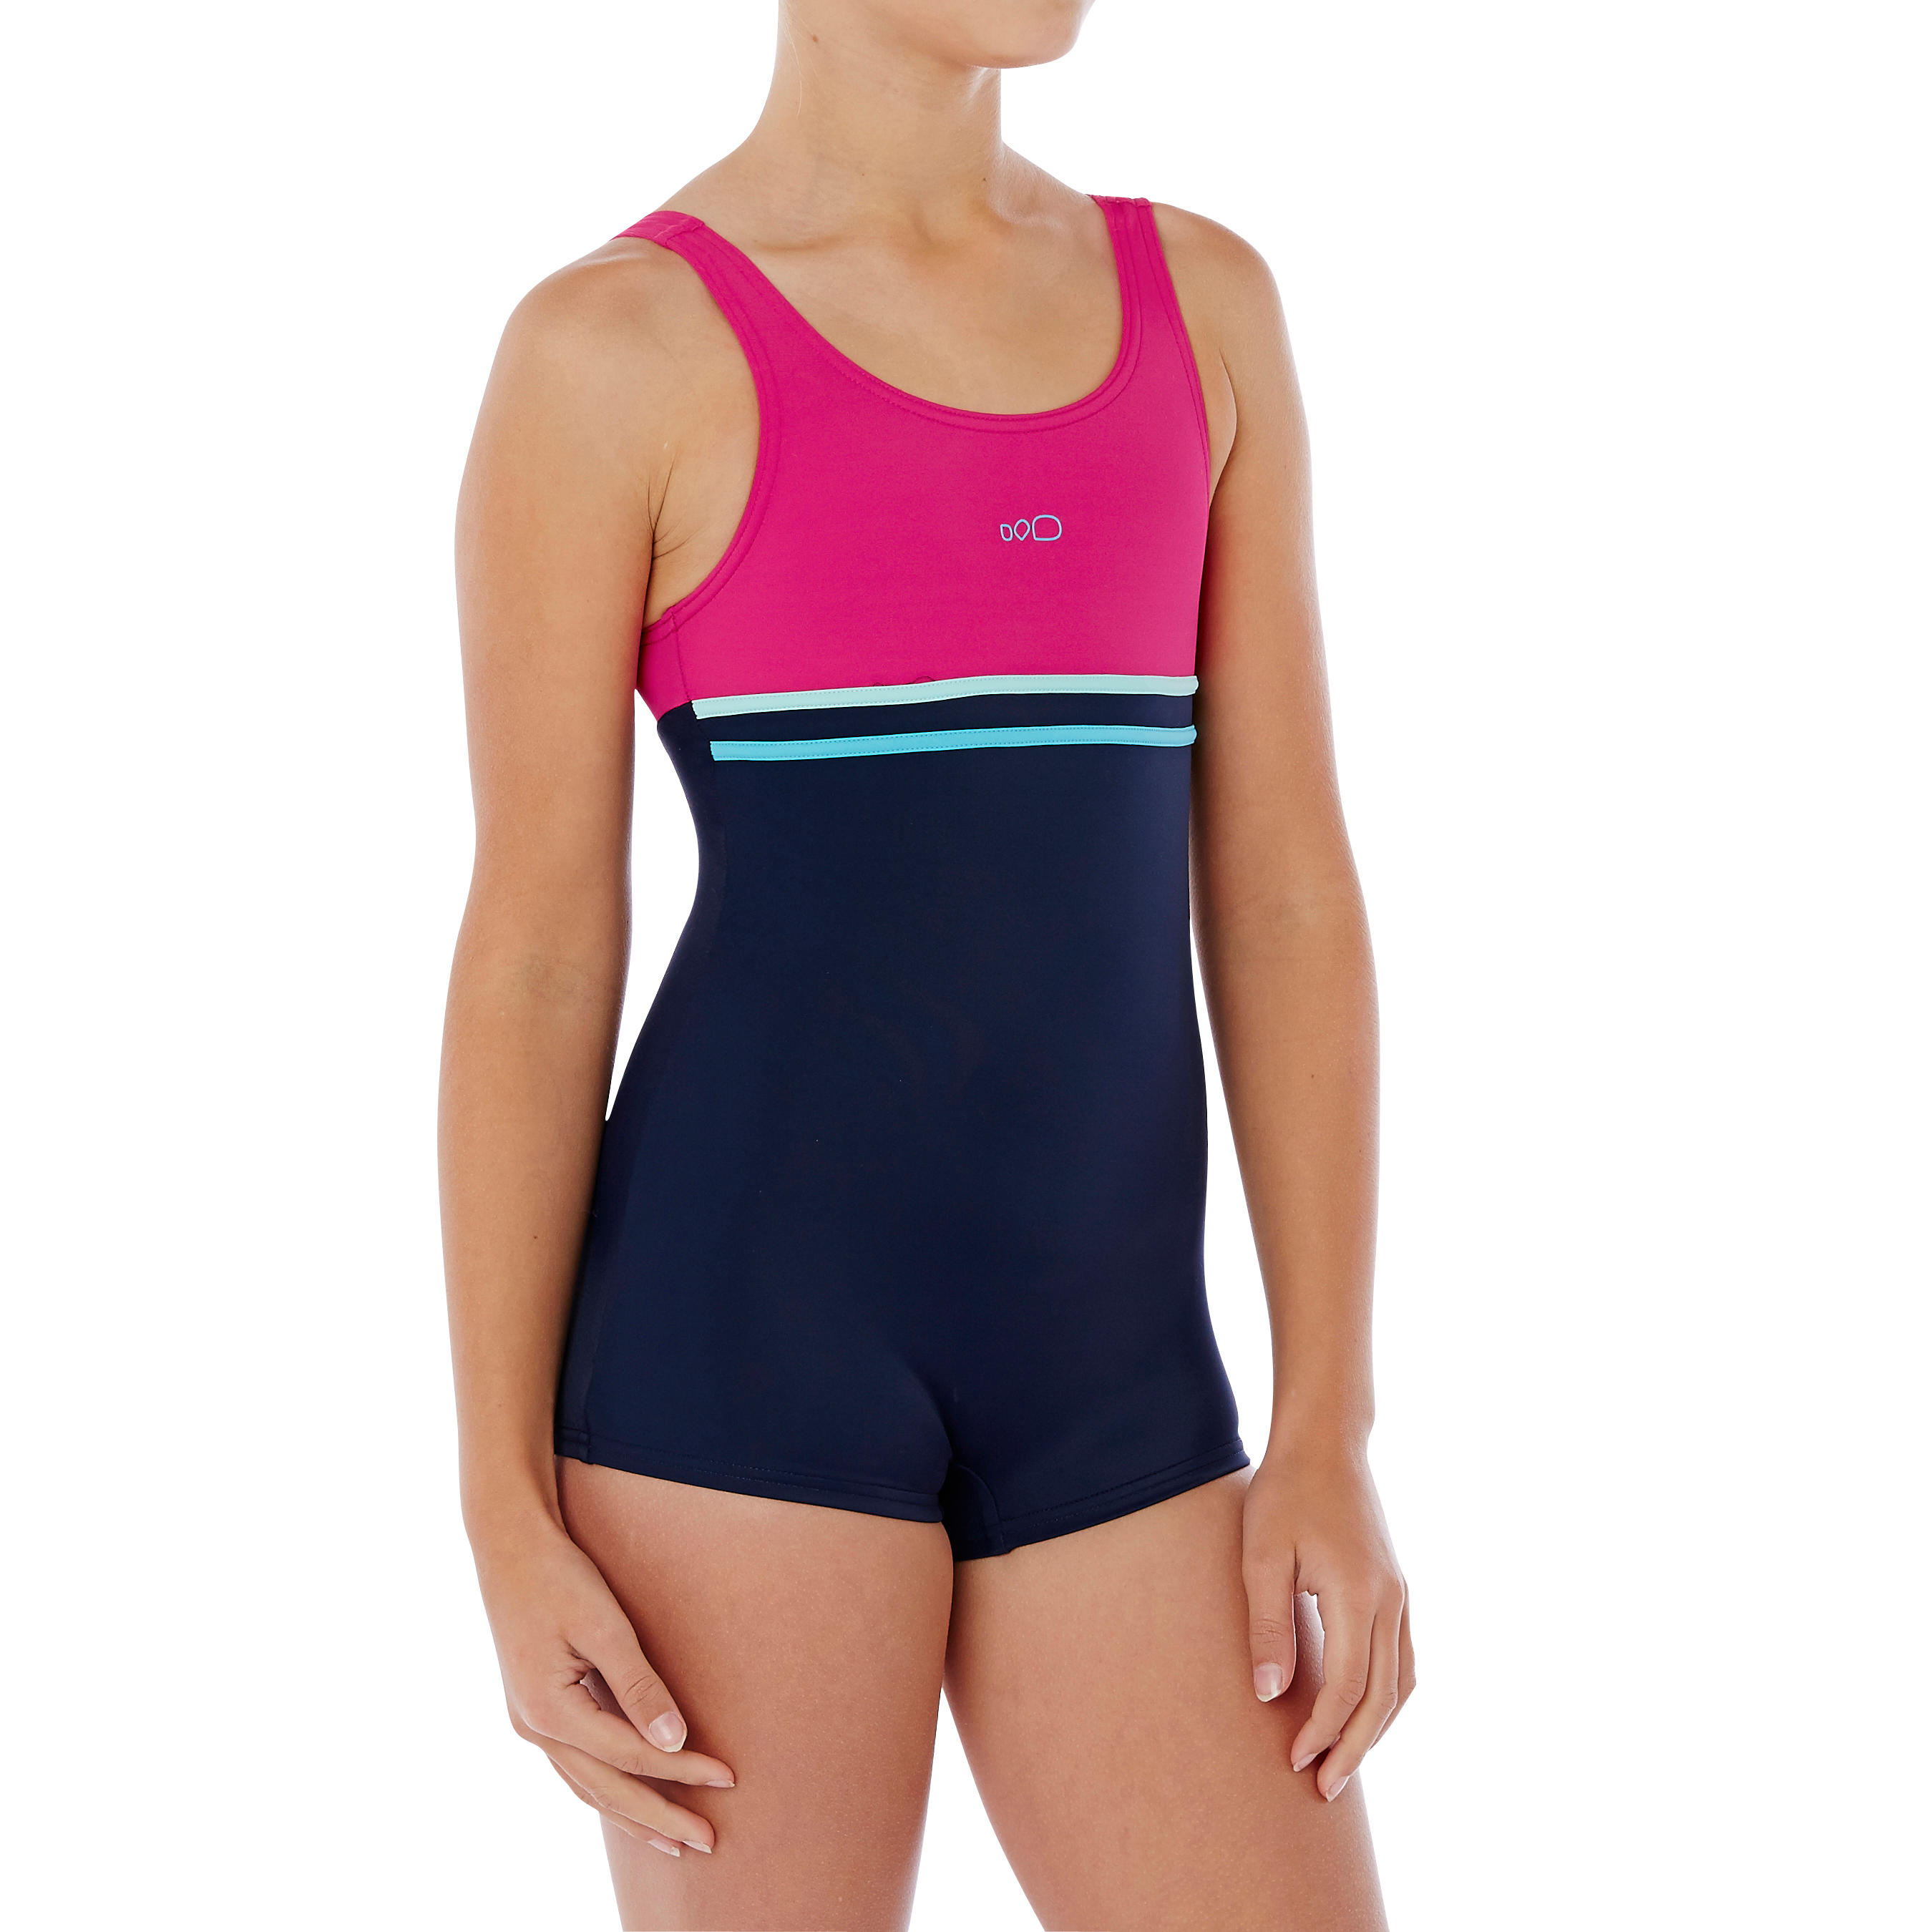 Loran Girls' One-Piece Shorty Swimsuit - Blue & Pink